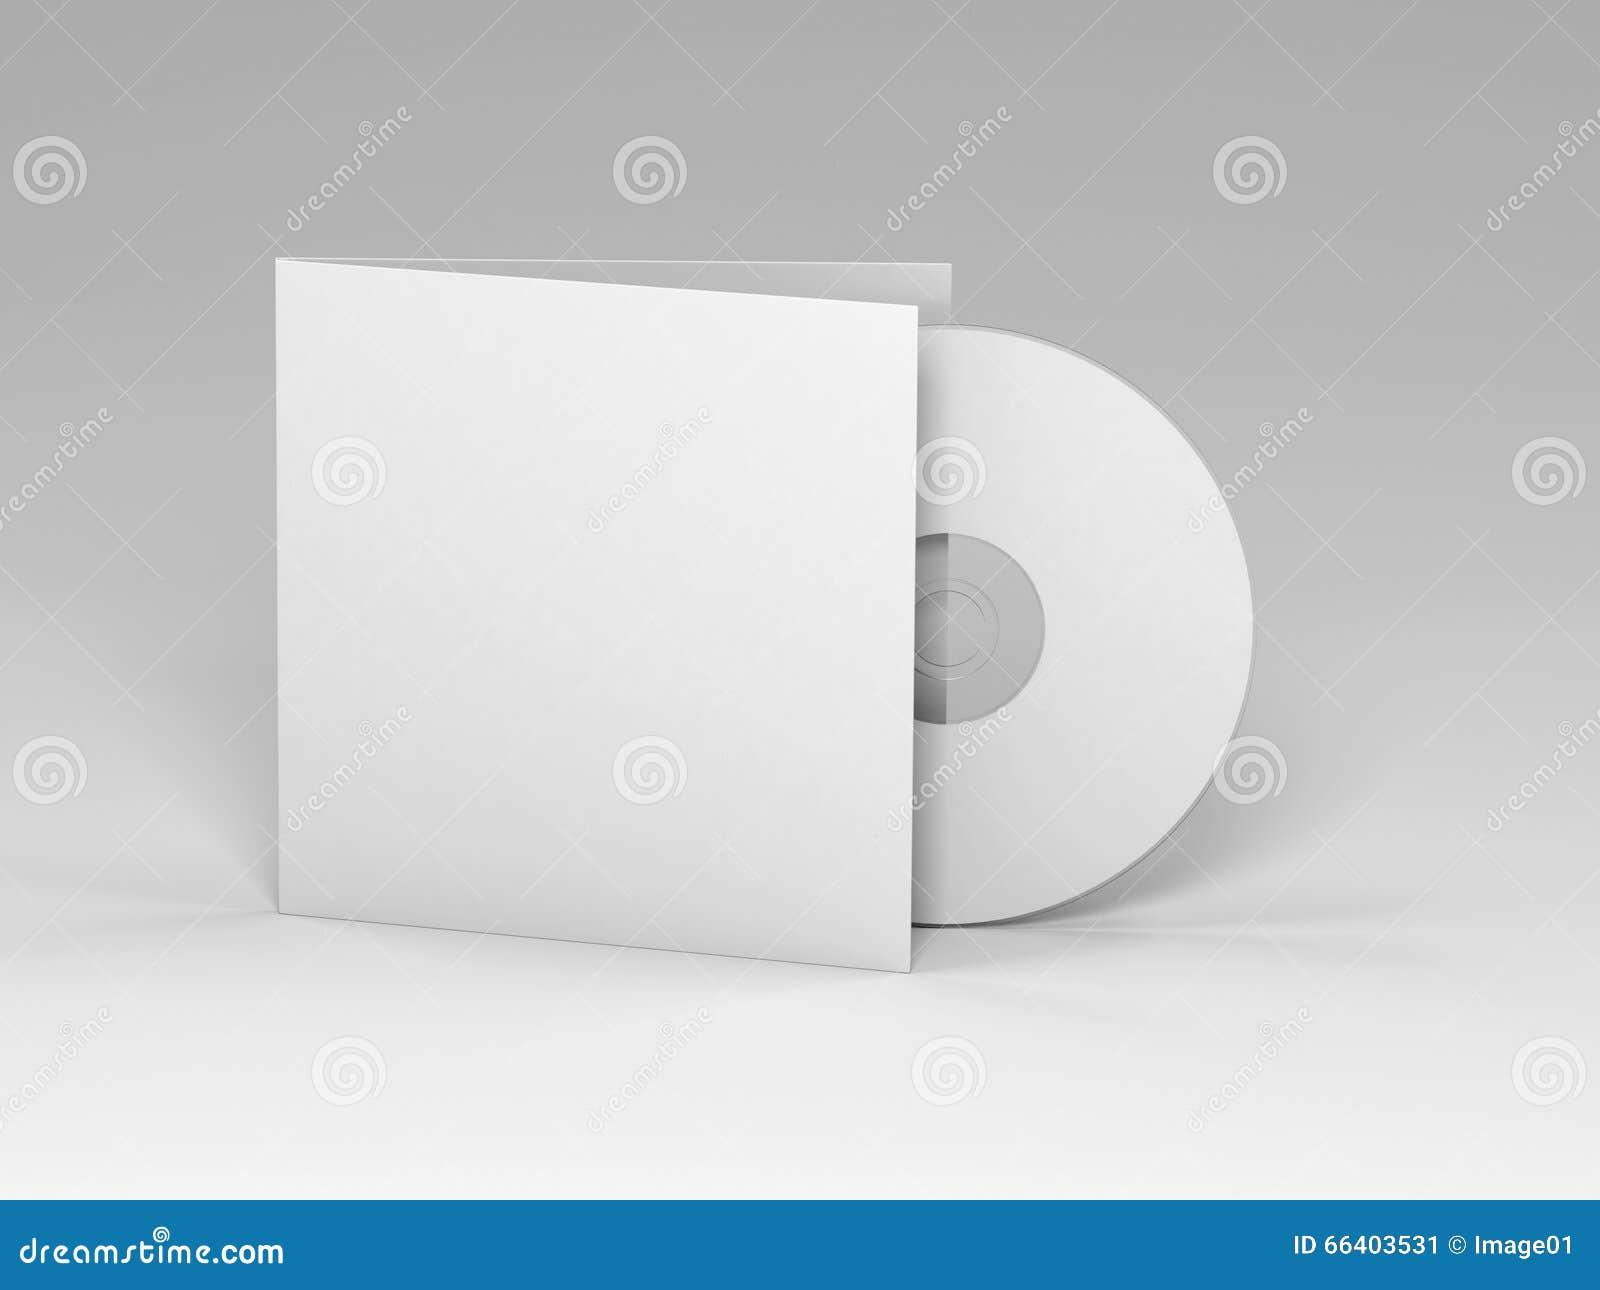 Blank Cd Cover Stock Illustration - Image: 50253304